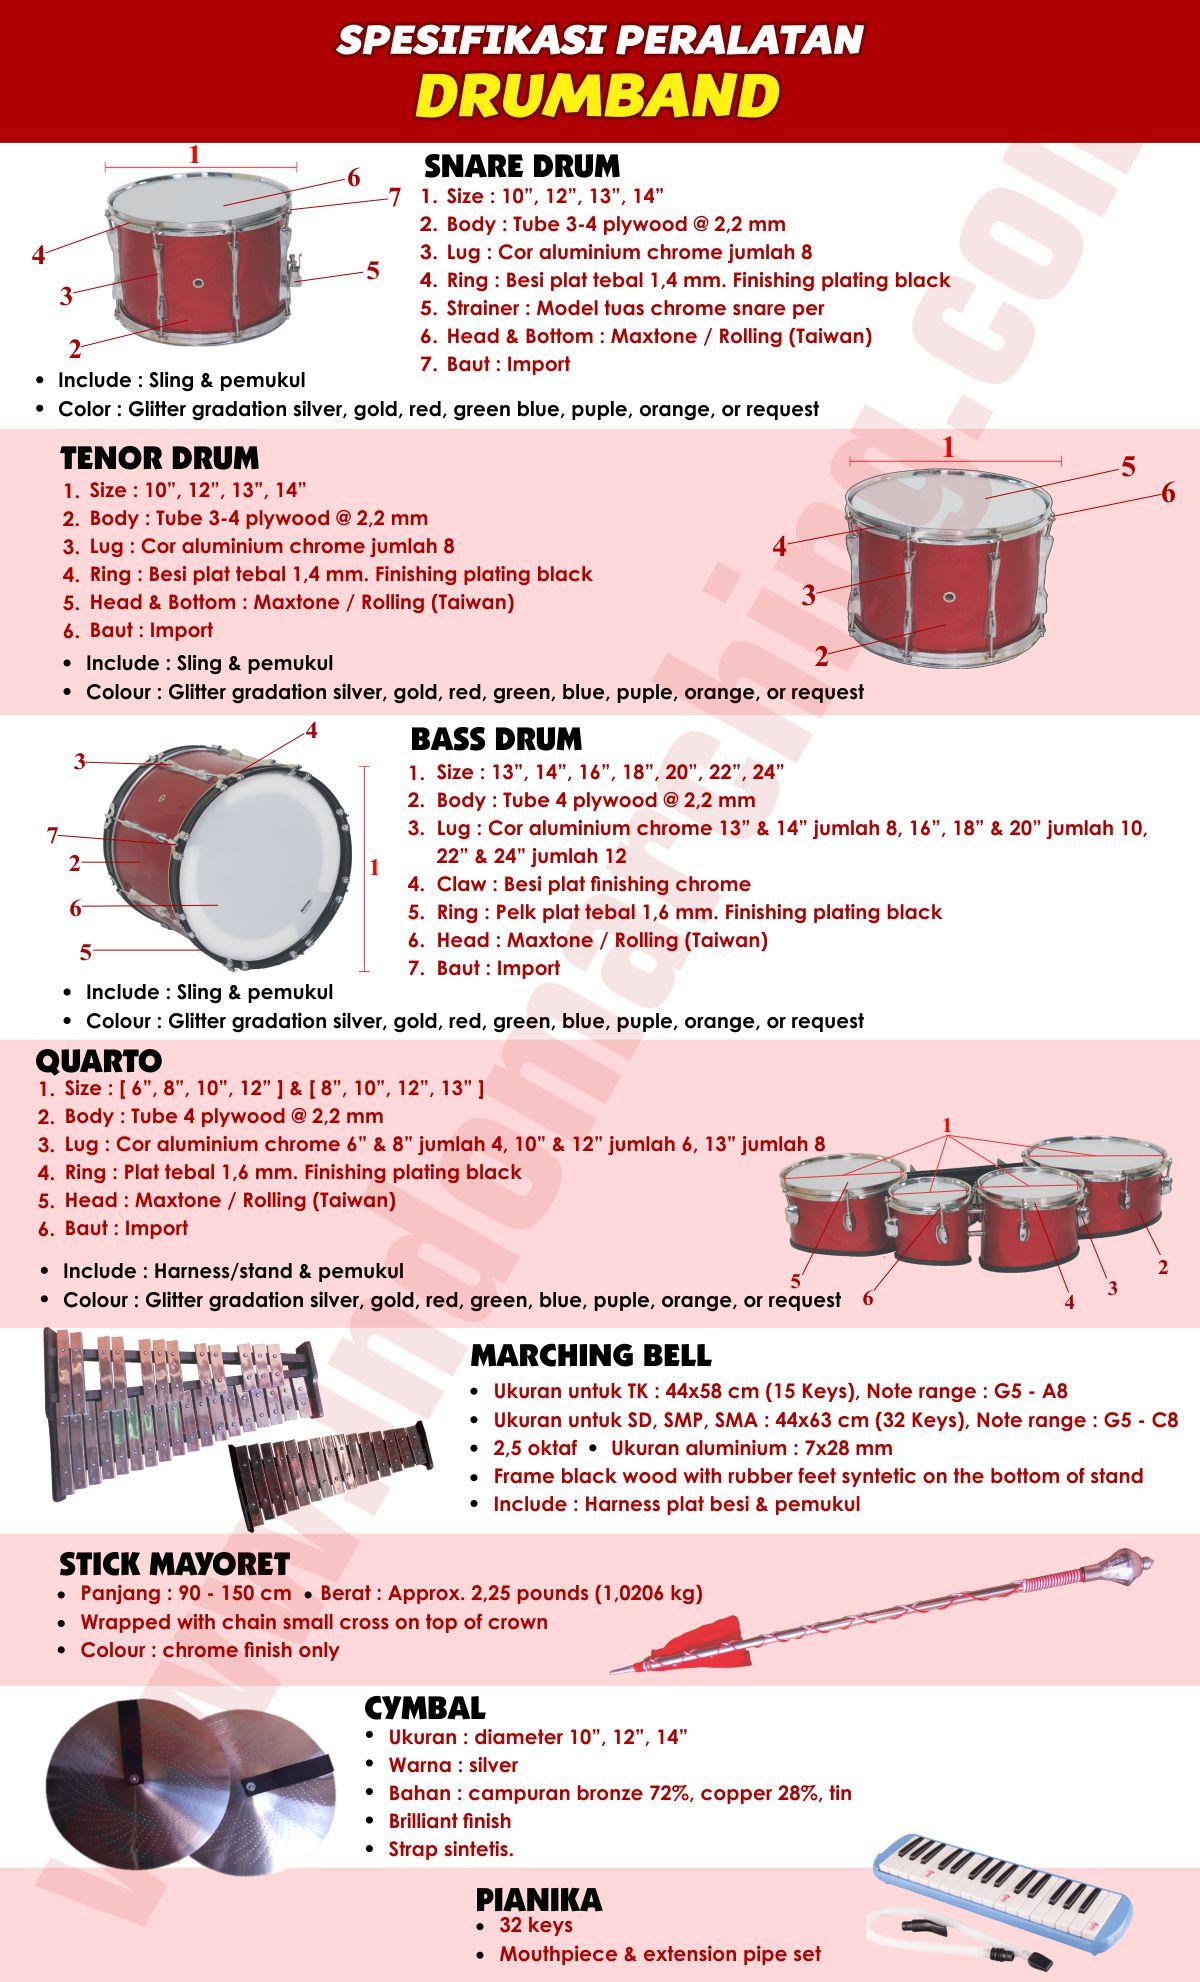 Spesifikasi Peralatan Drumband IndoMarching